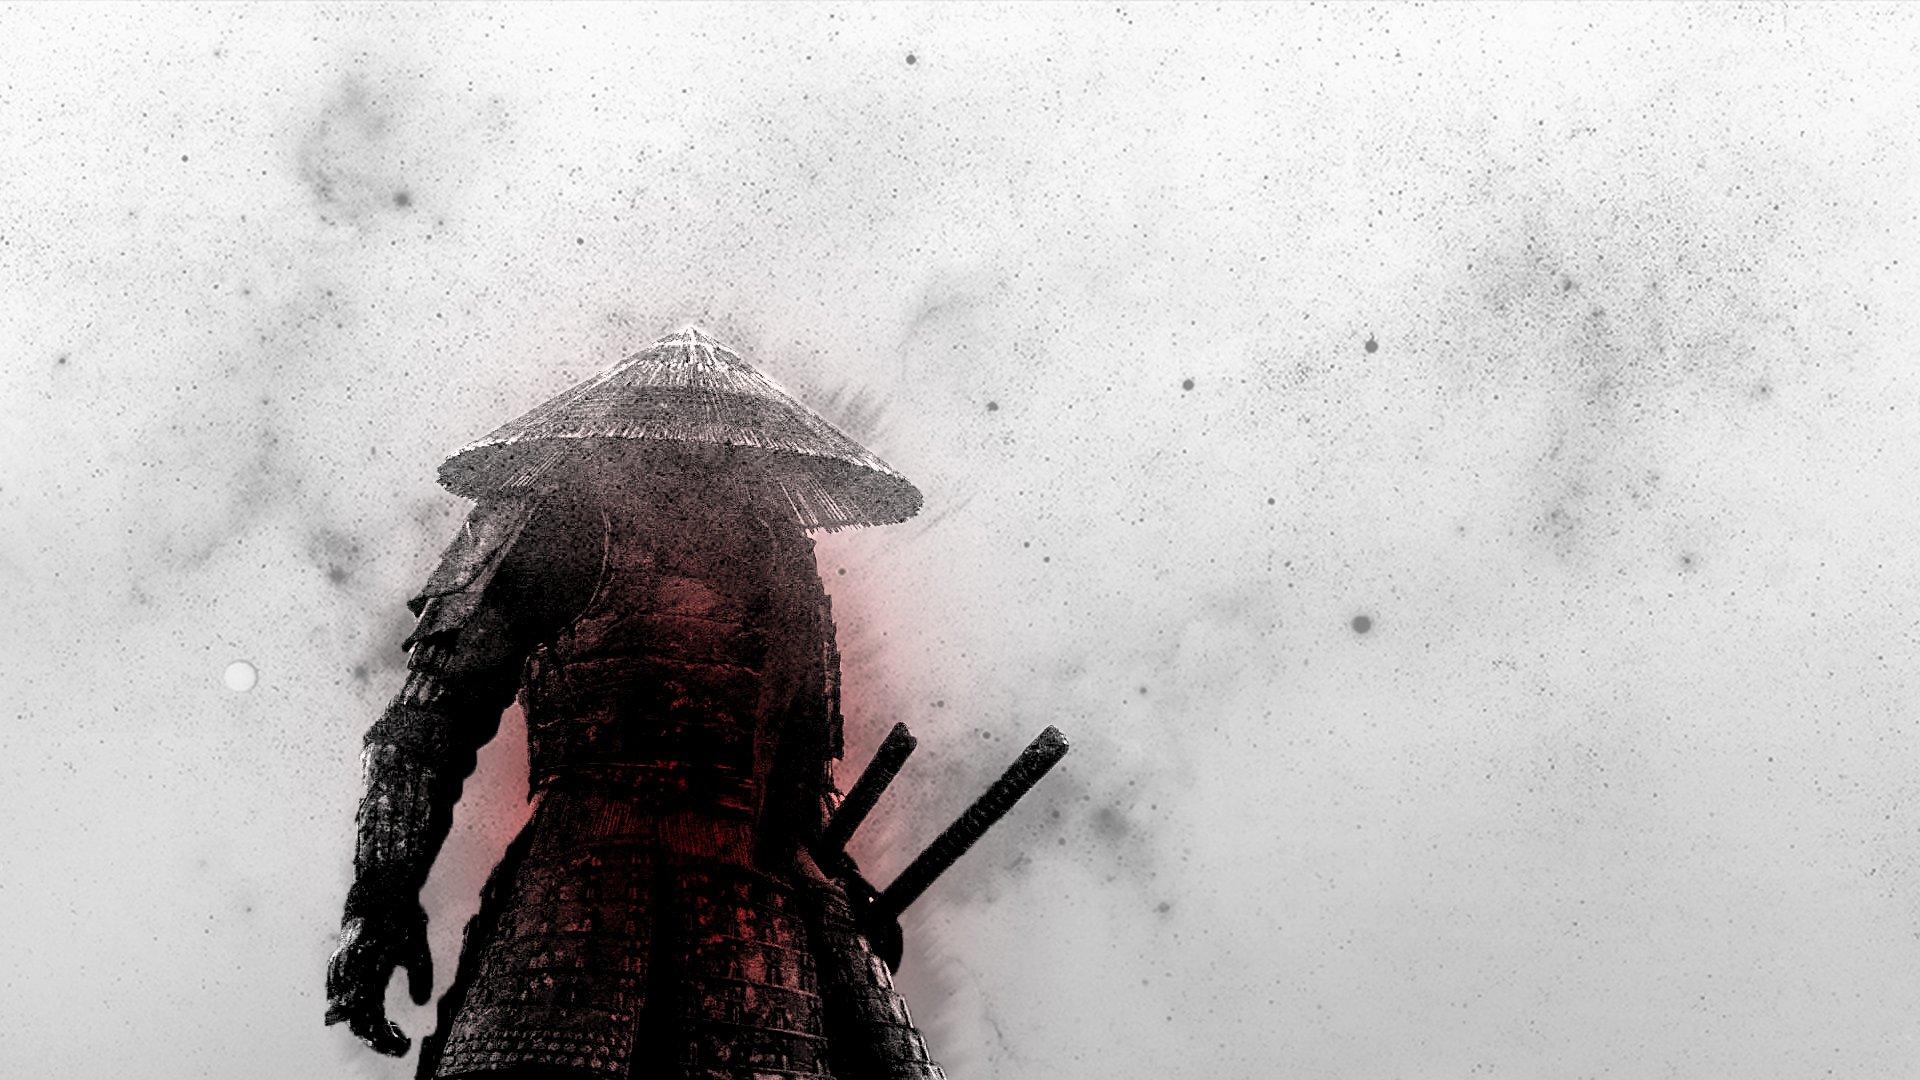 Samurai wallpaper by nihilusdesigns d6jmzu5 wallpaper 1920x1080 1920x1080